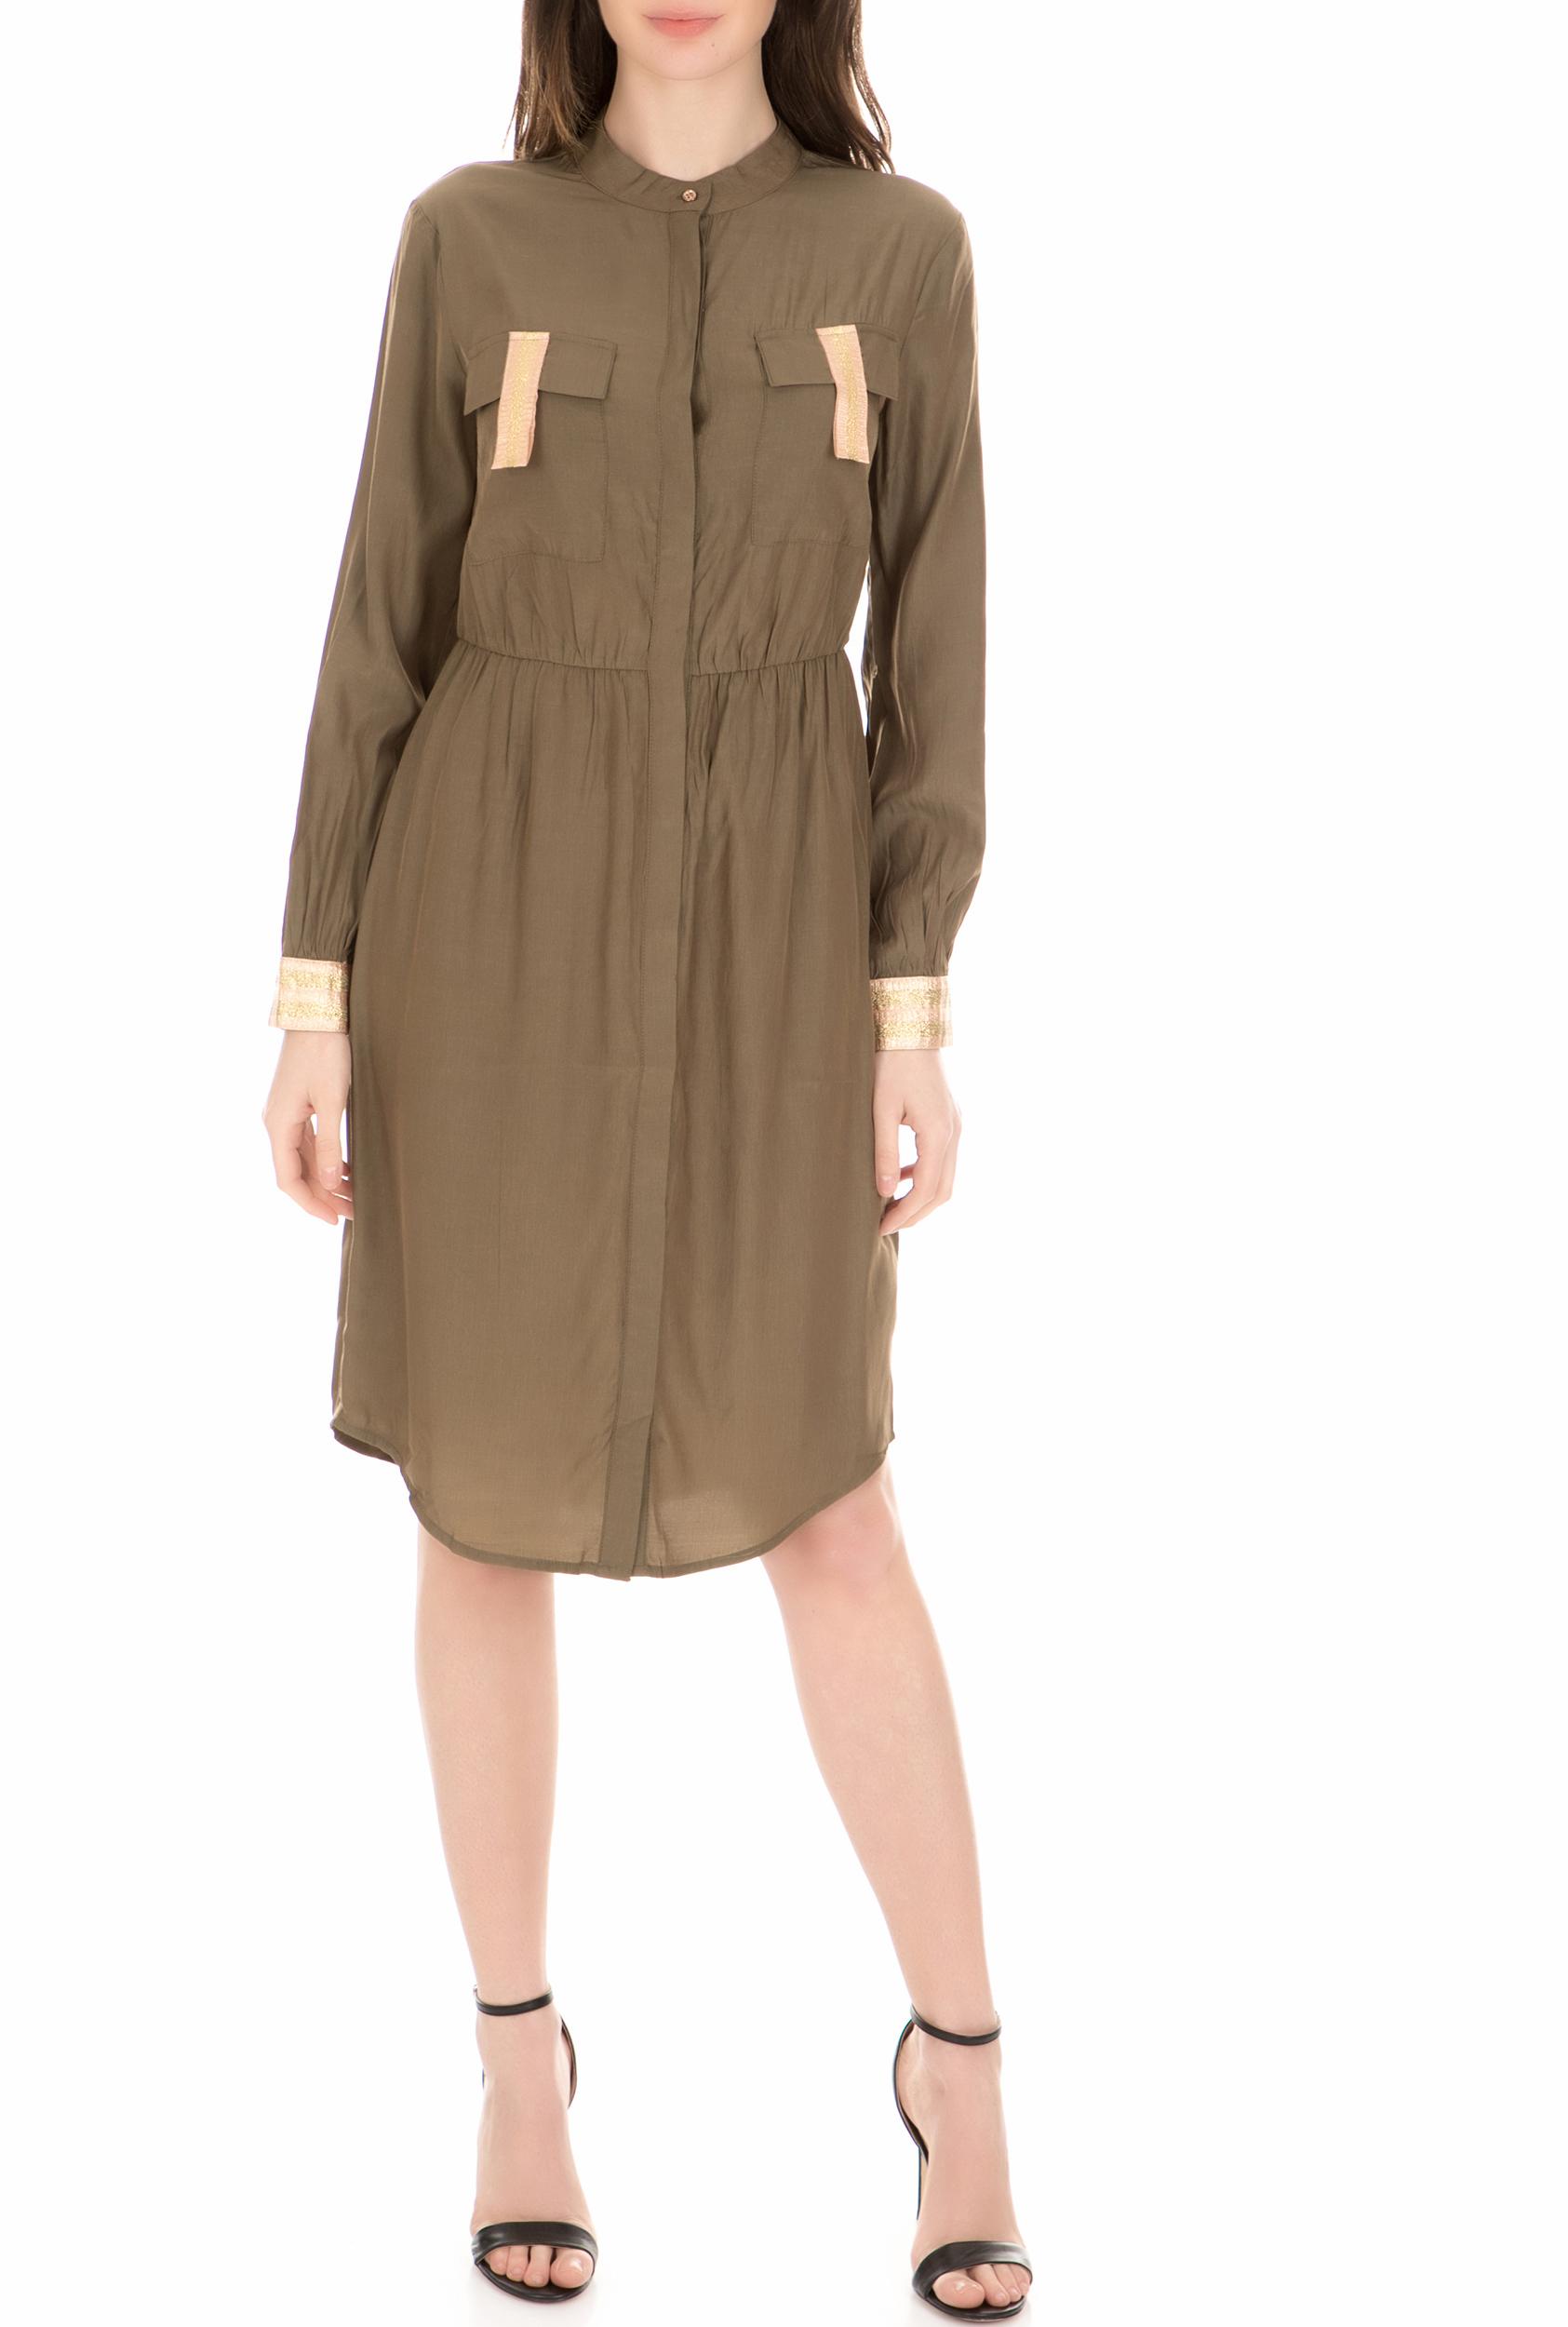 NU - Γυναικείο φόρεμα NU χακί